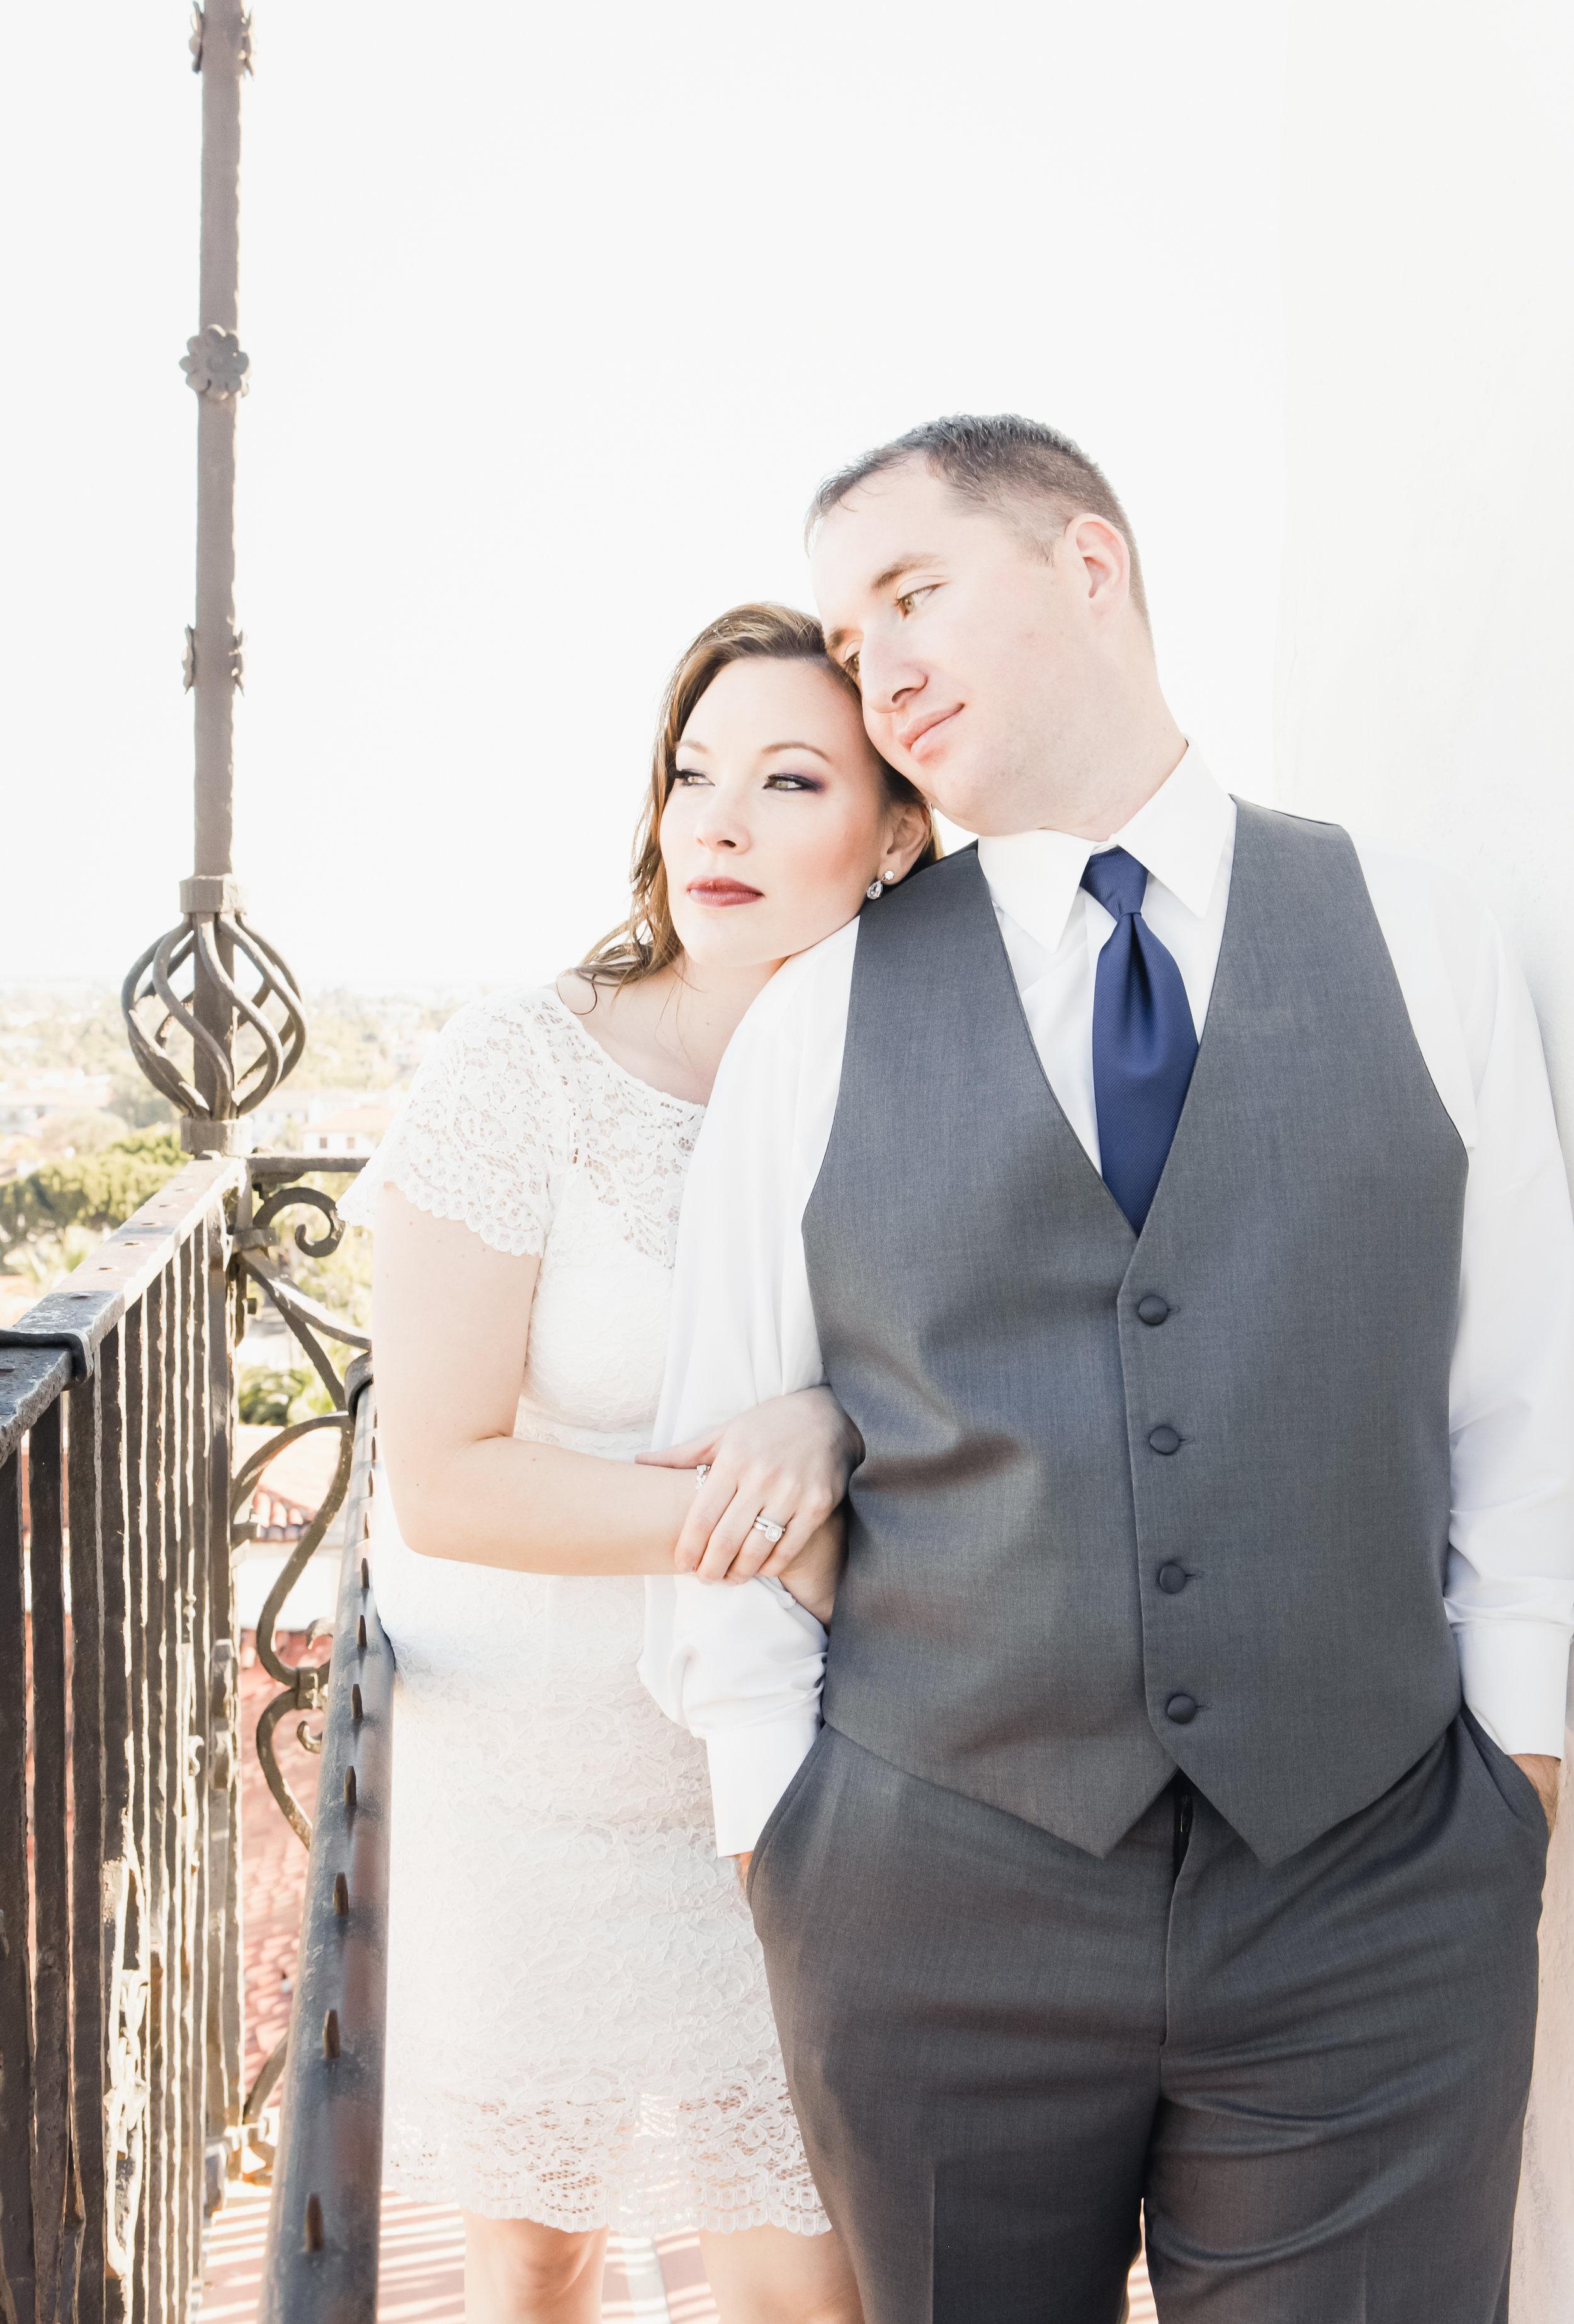 Gianna Keiko Atlanta Destination Wedding Elopement Photographer-35.jpg